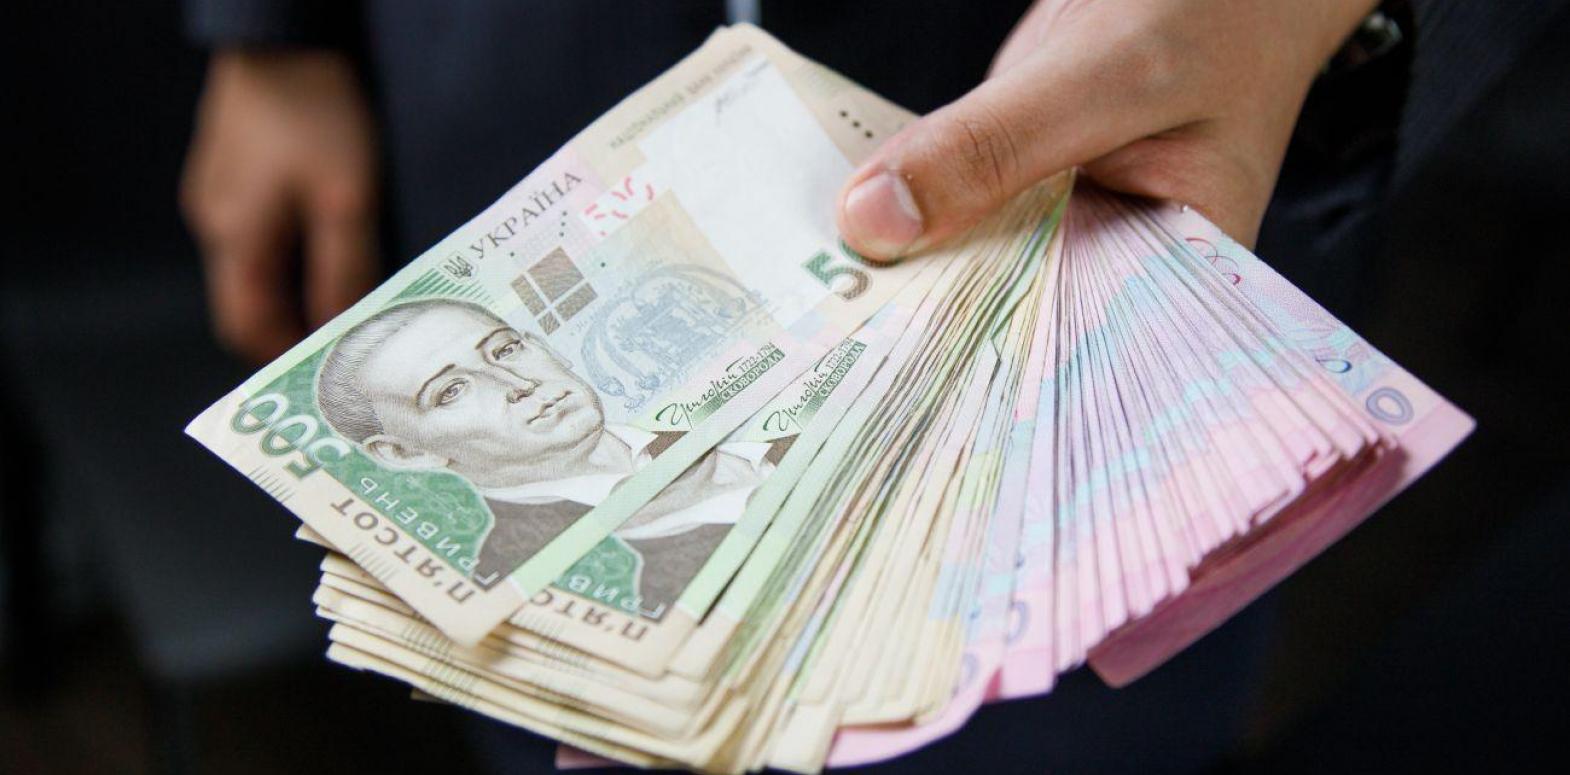 Средняя зарплата в Украине за месяц выросла на 240 гривен